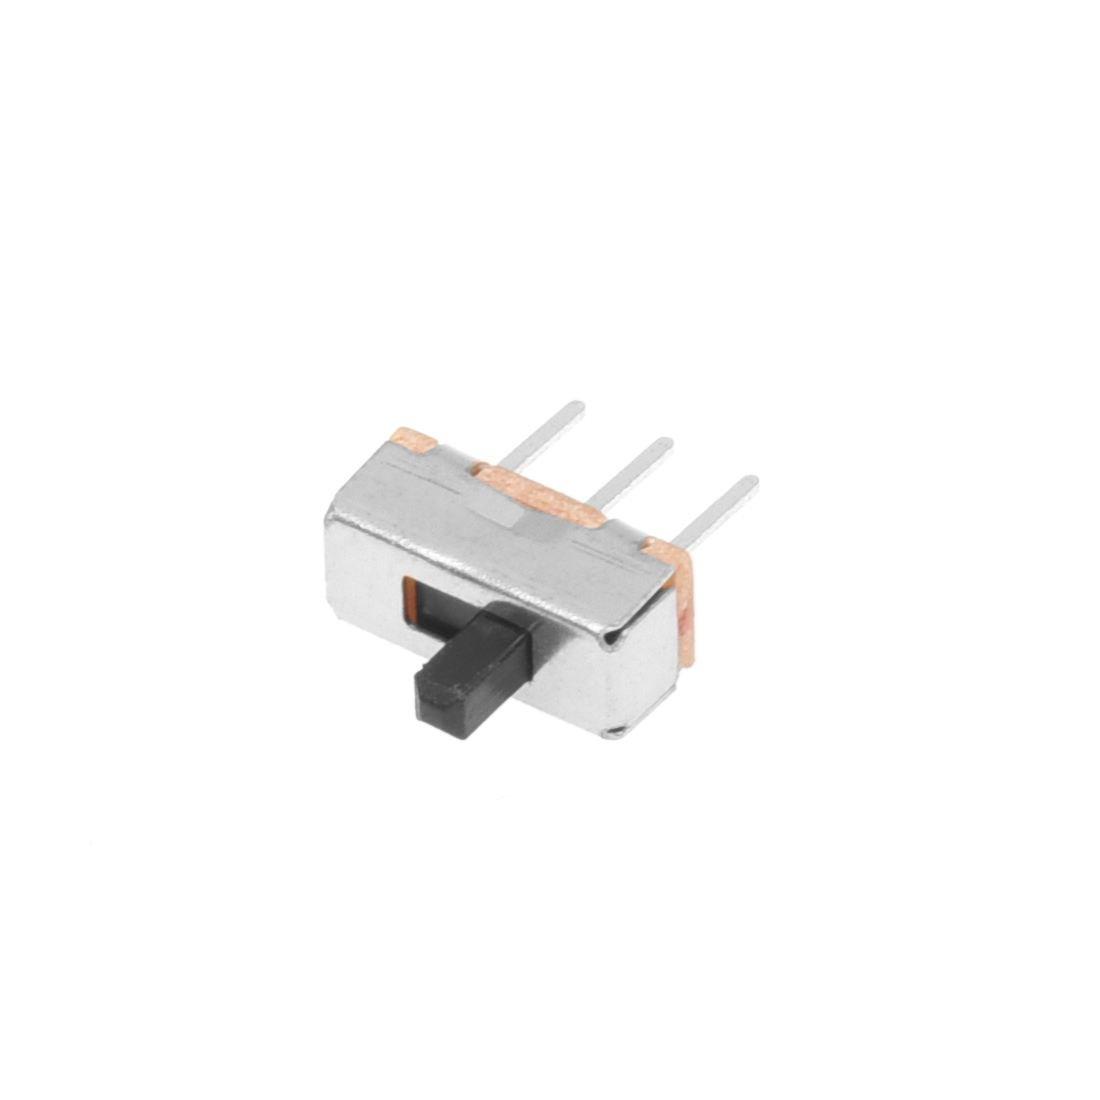 Iycorish 50pzs SS12D00G3 2 posiciones SPDT 1P2T 3 Pines interruptor deslizante vertical del panel PCB